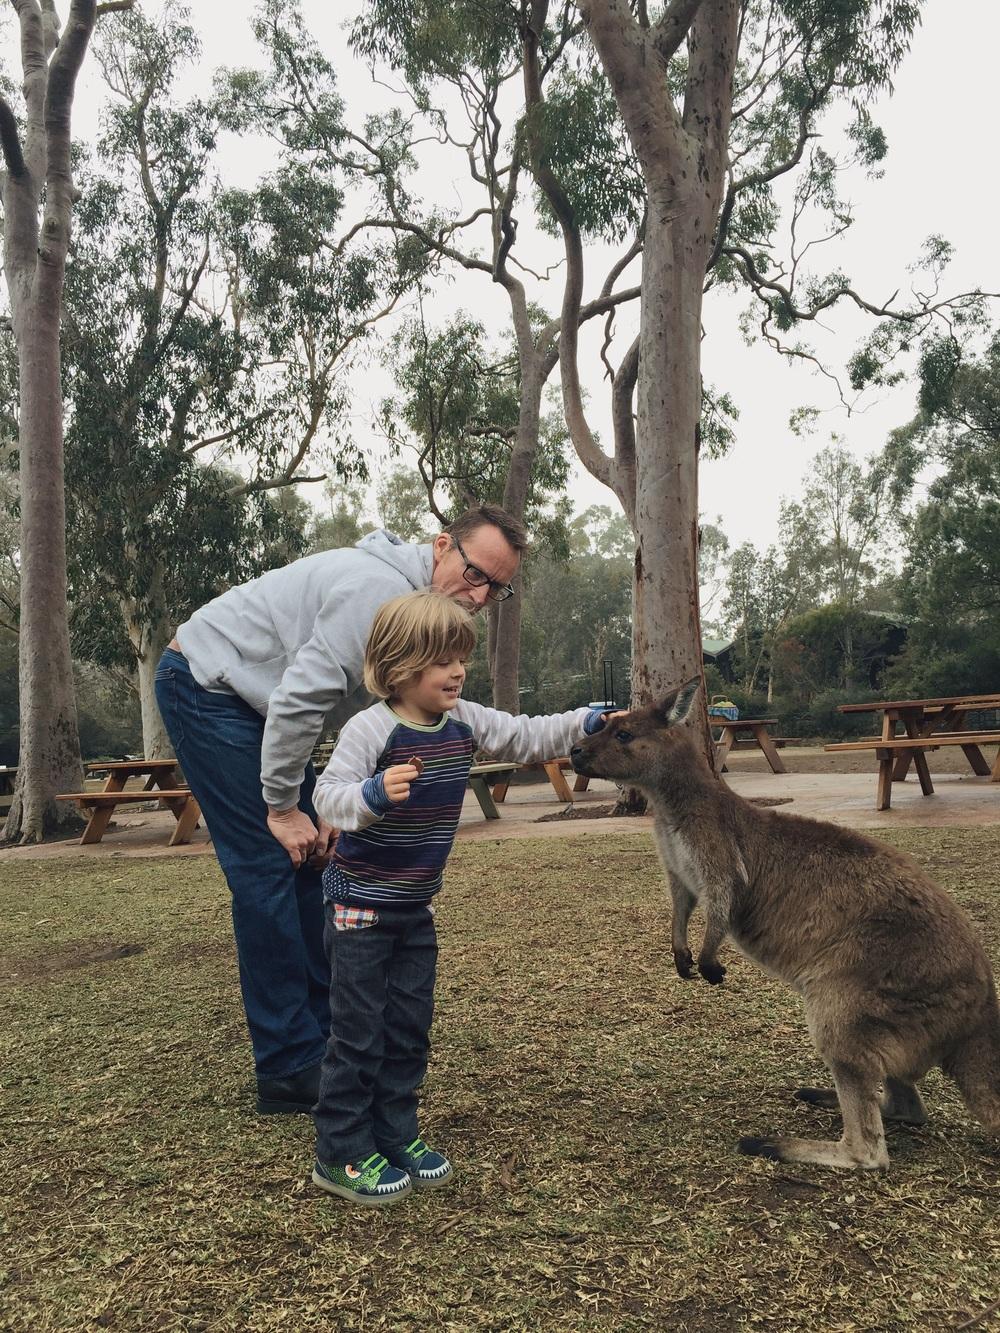 Mr 3 patting the kangaroo